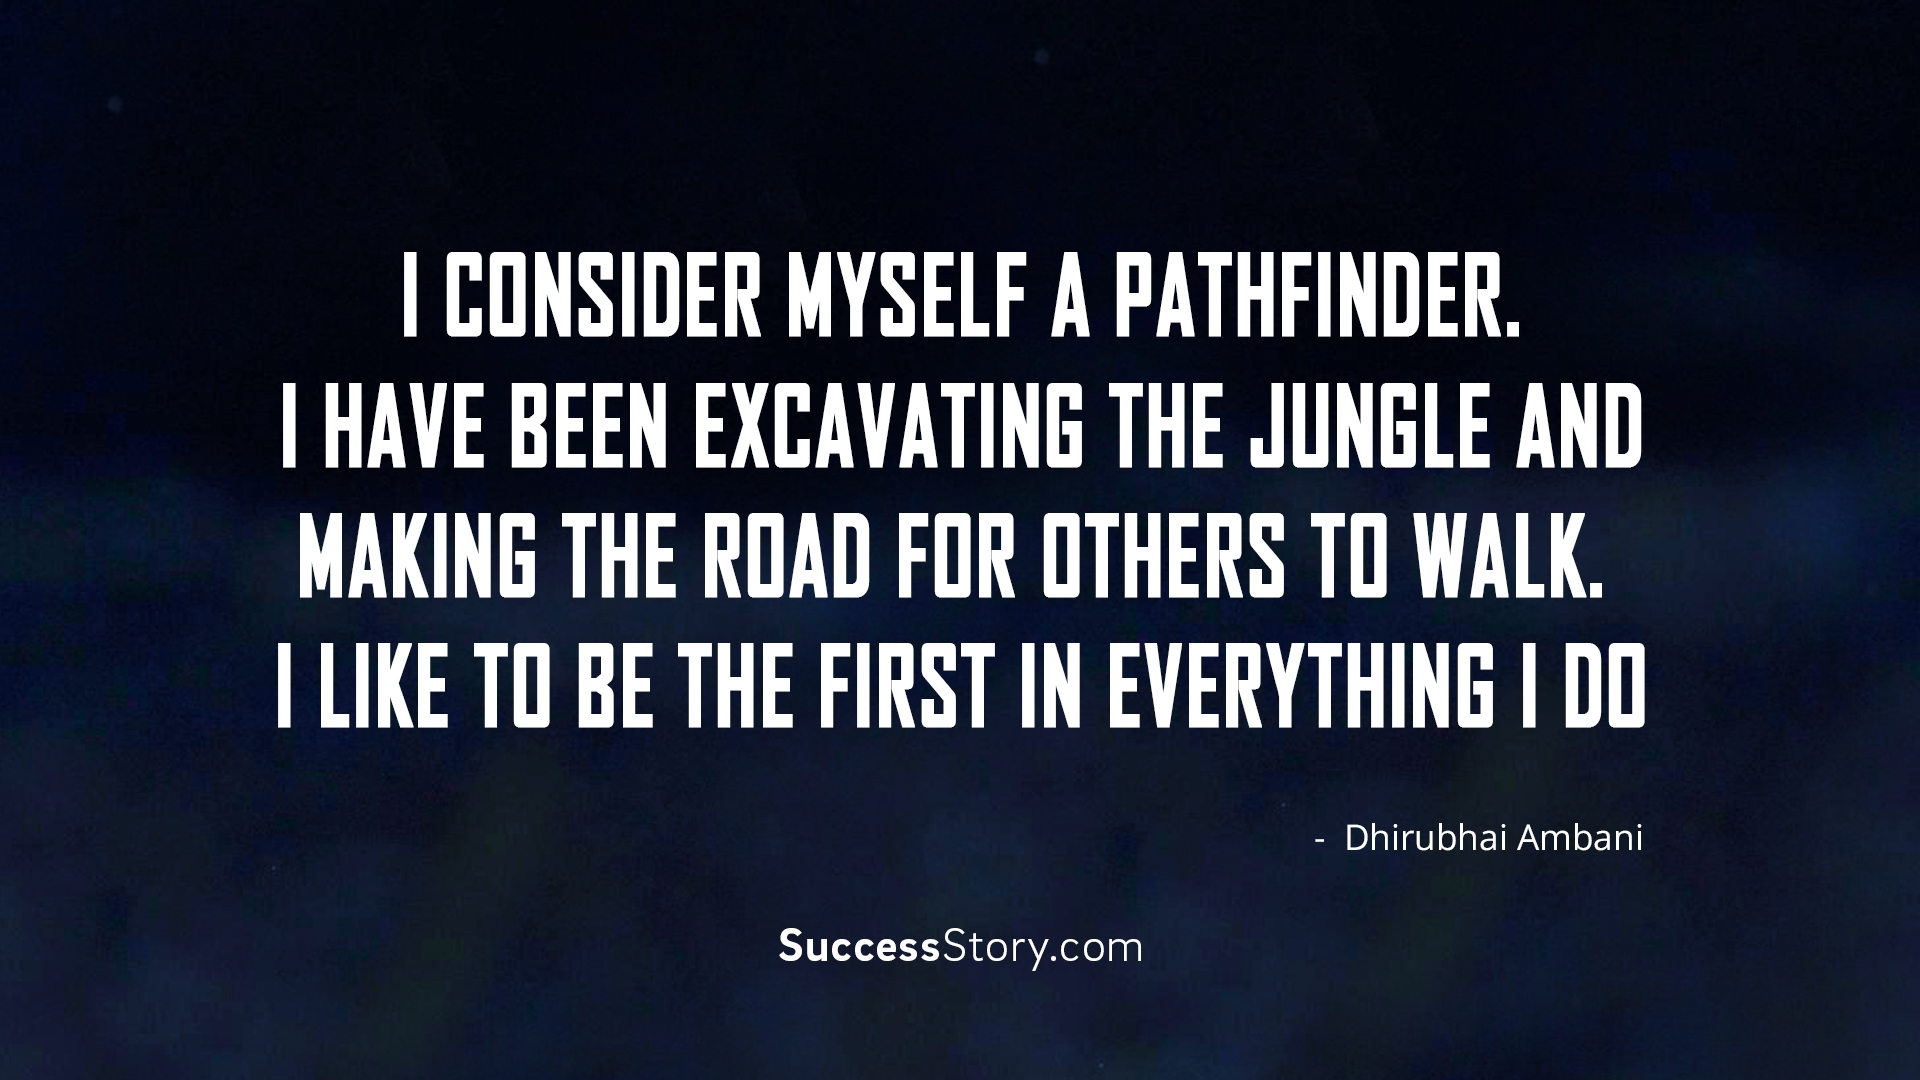 I consider myself a pathfinder